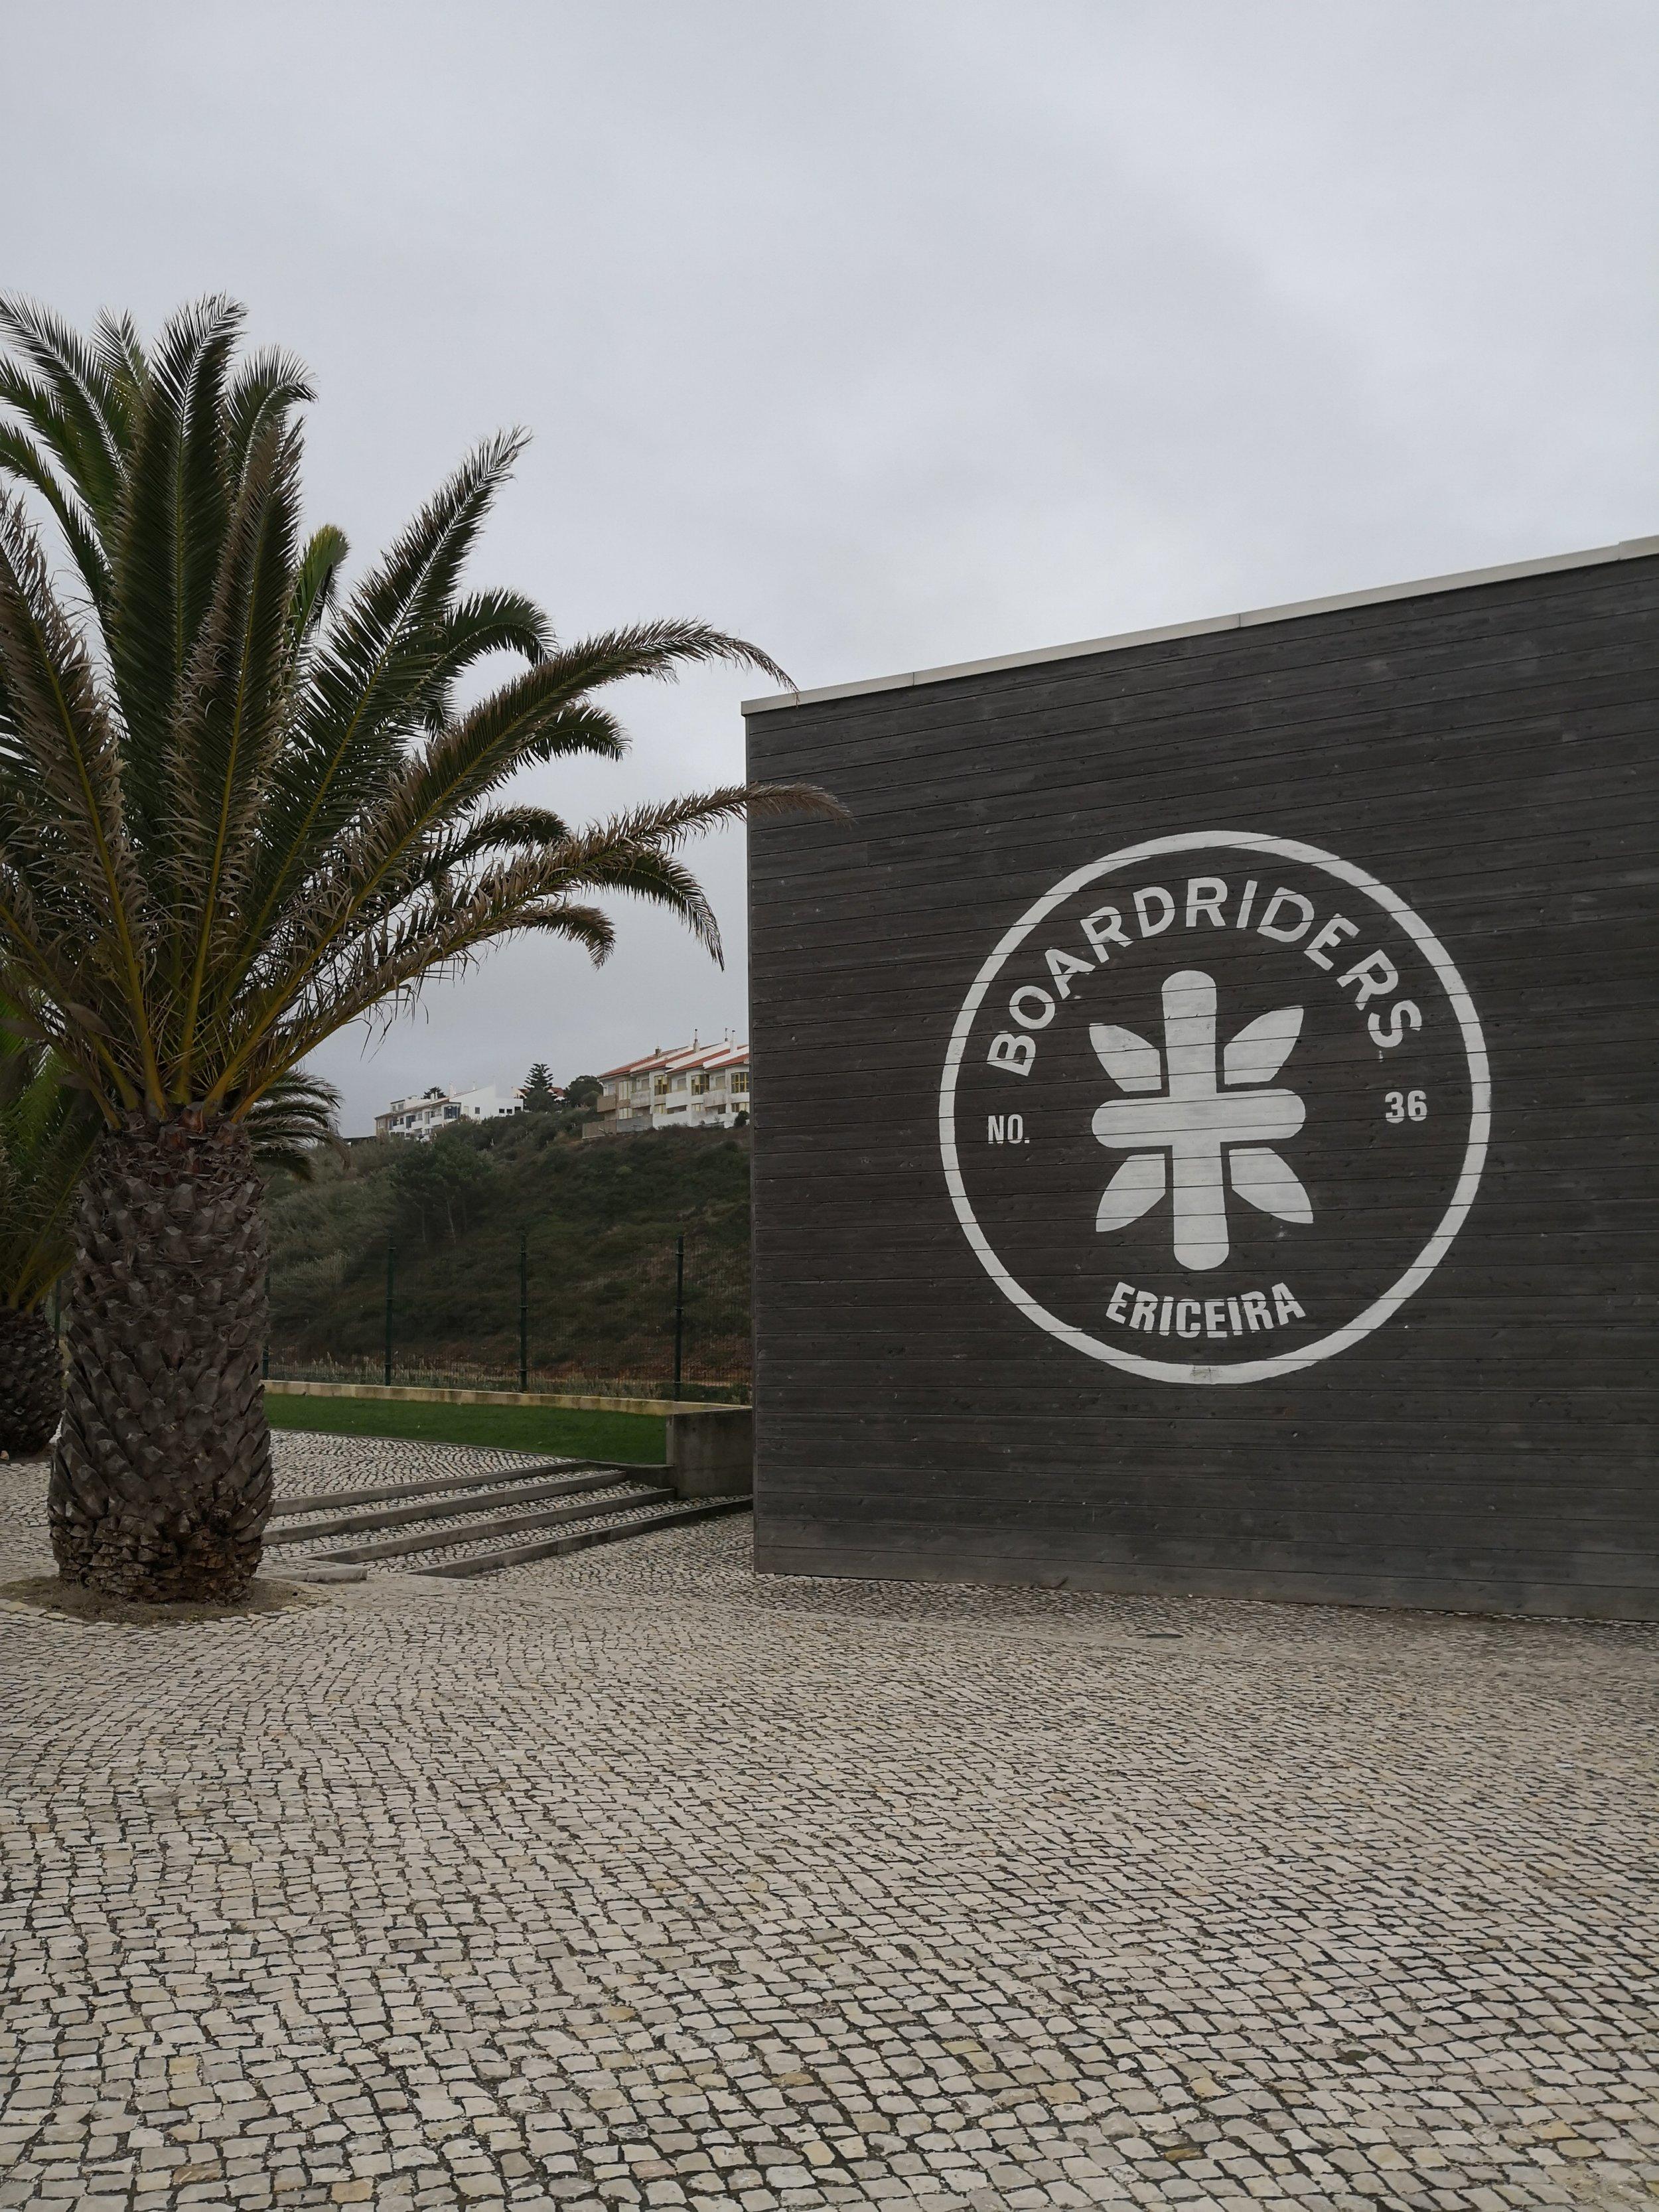 Boardriders-Ericeria-Palme-Portugal.jpg